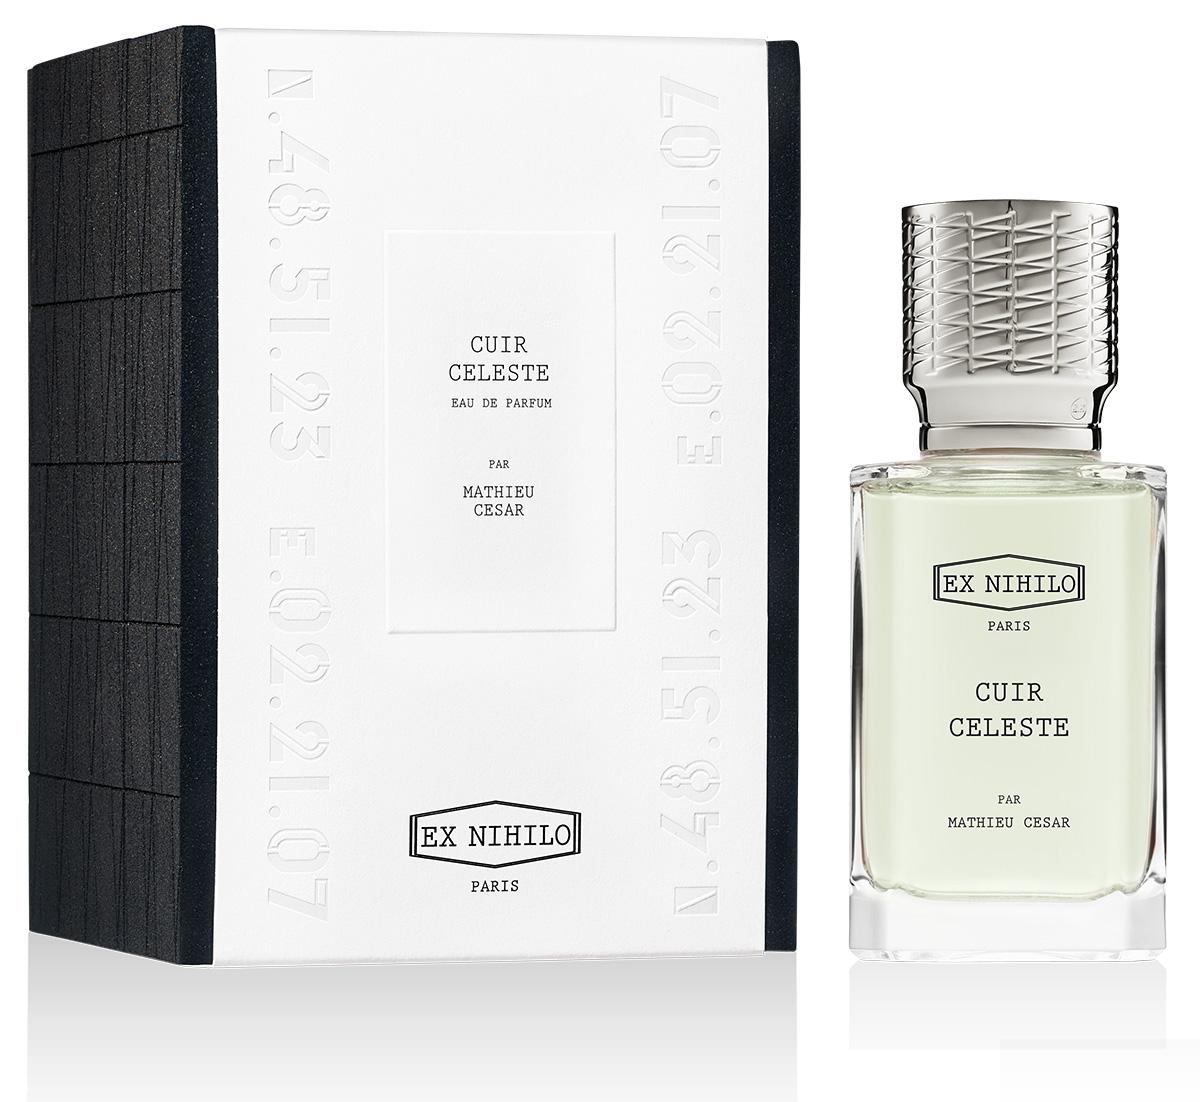 Selective perfume Ex Nihilo Fleur Narcotique: reviews, description of fragrance